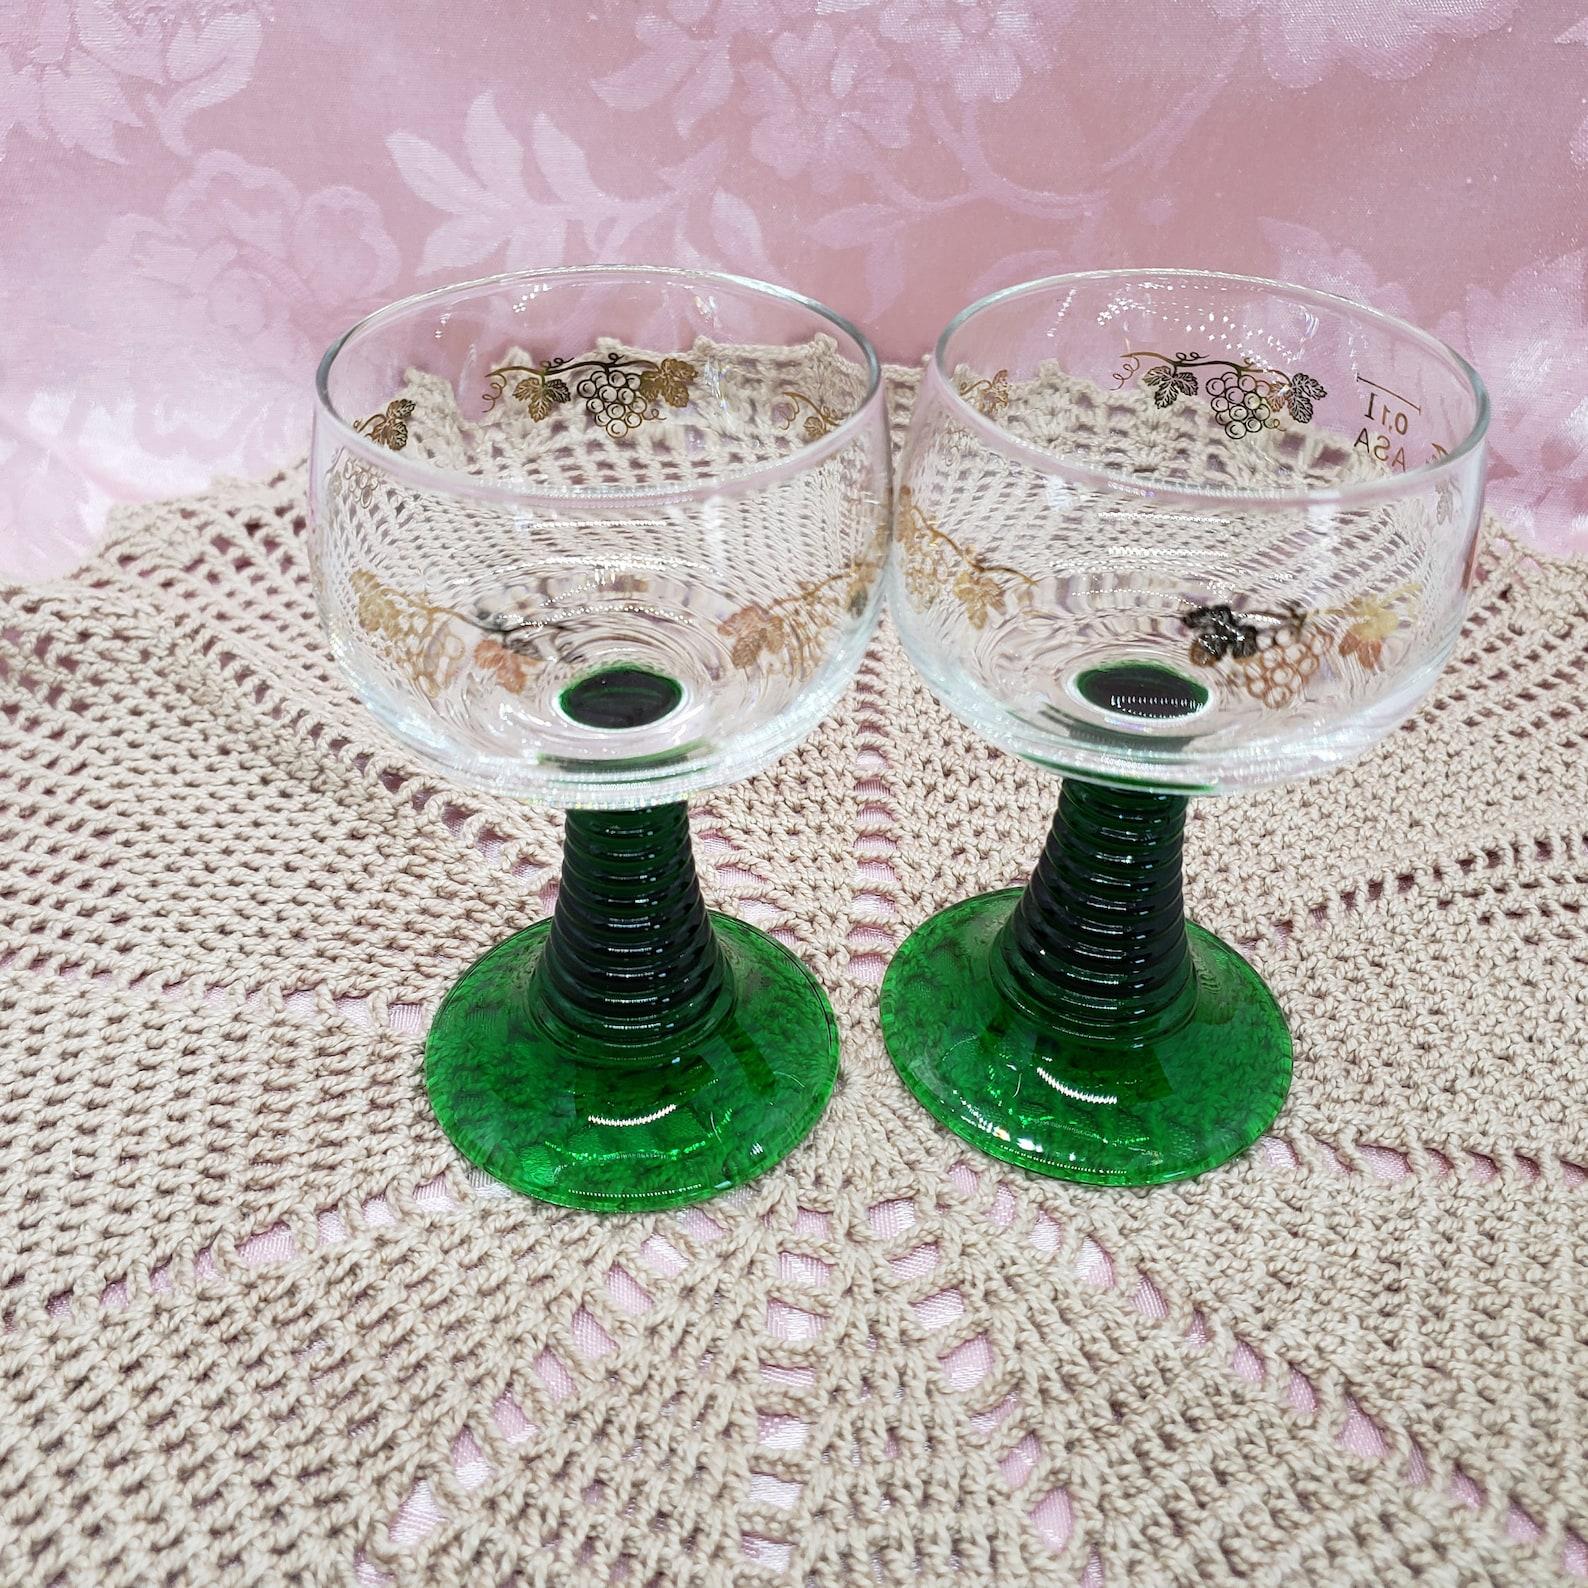 Roemer/Römer German Wine Glass Set 2, Gold vine pattern